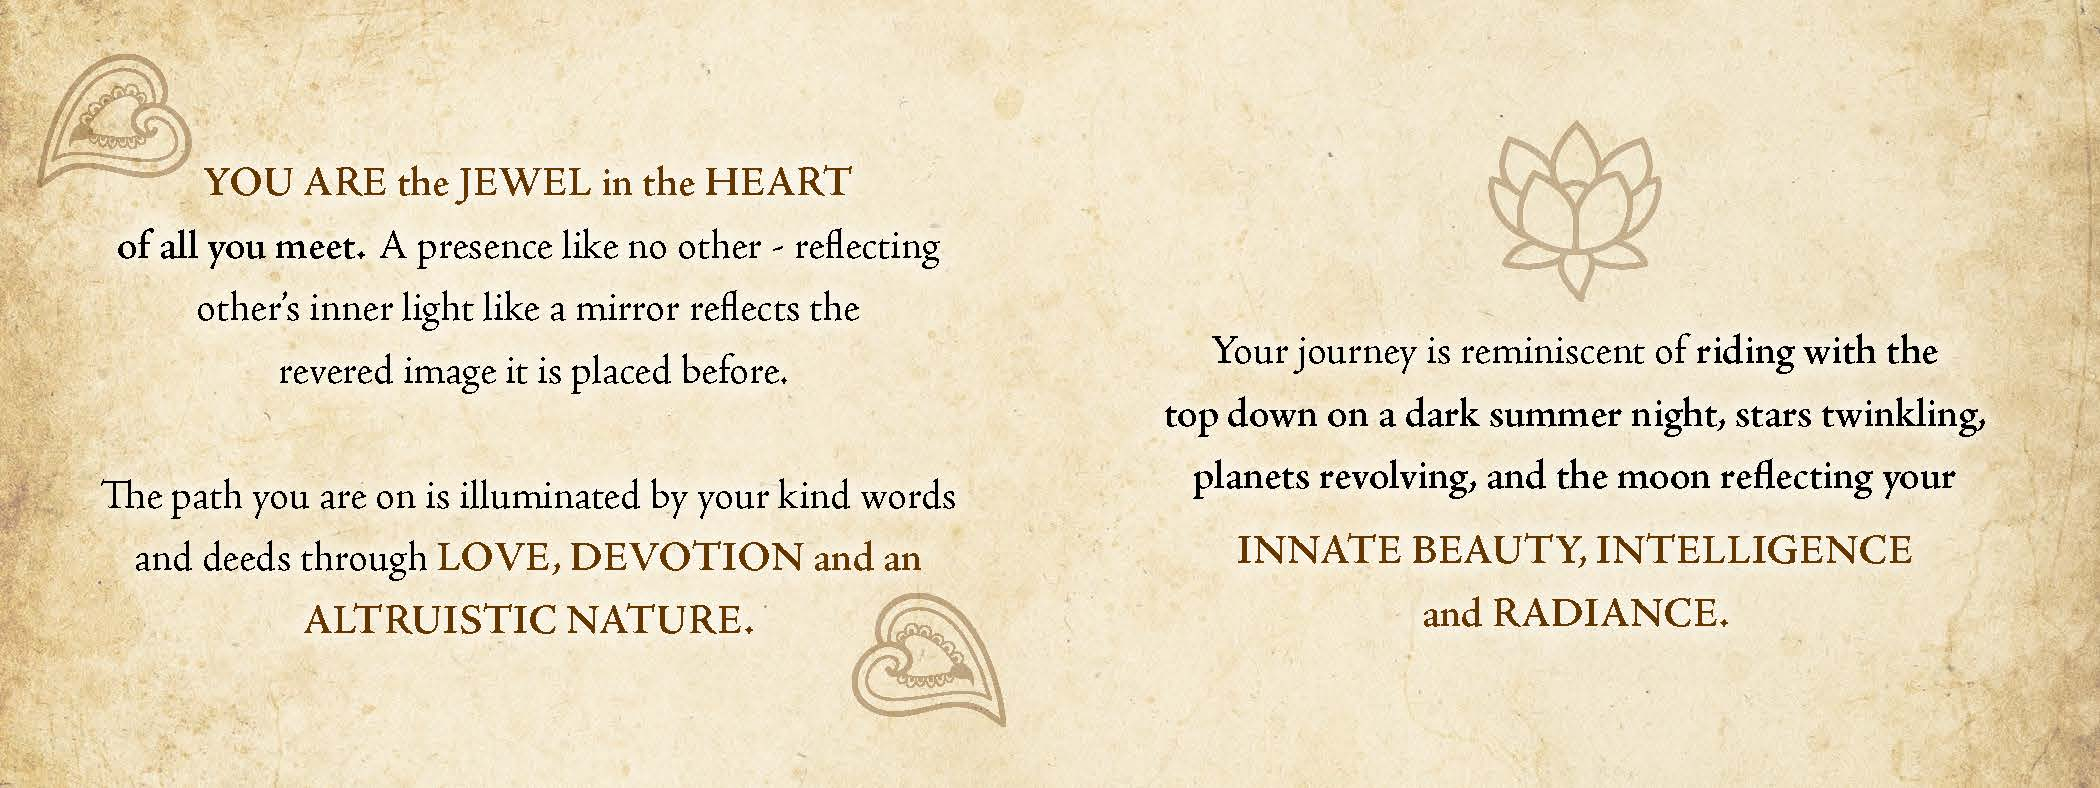 Vyana heart book2 (1)_Page_4.jpg